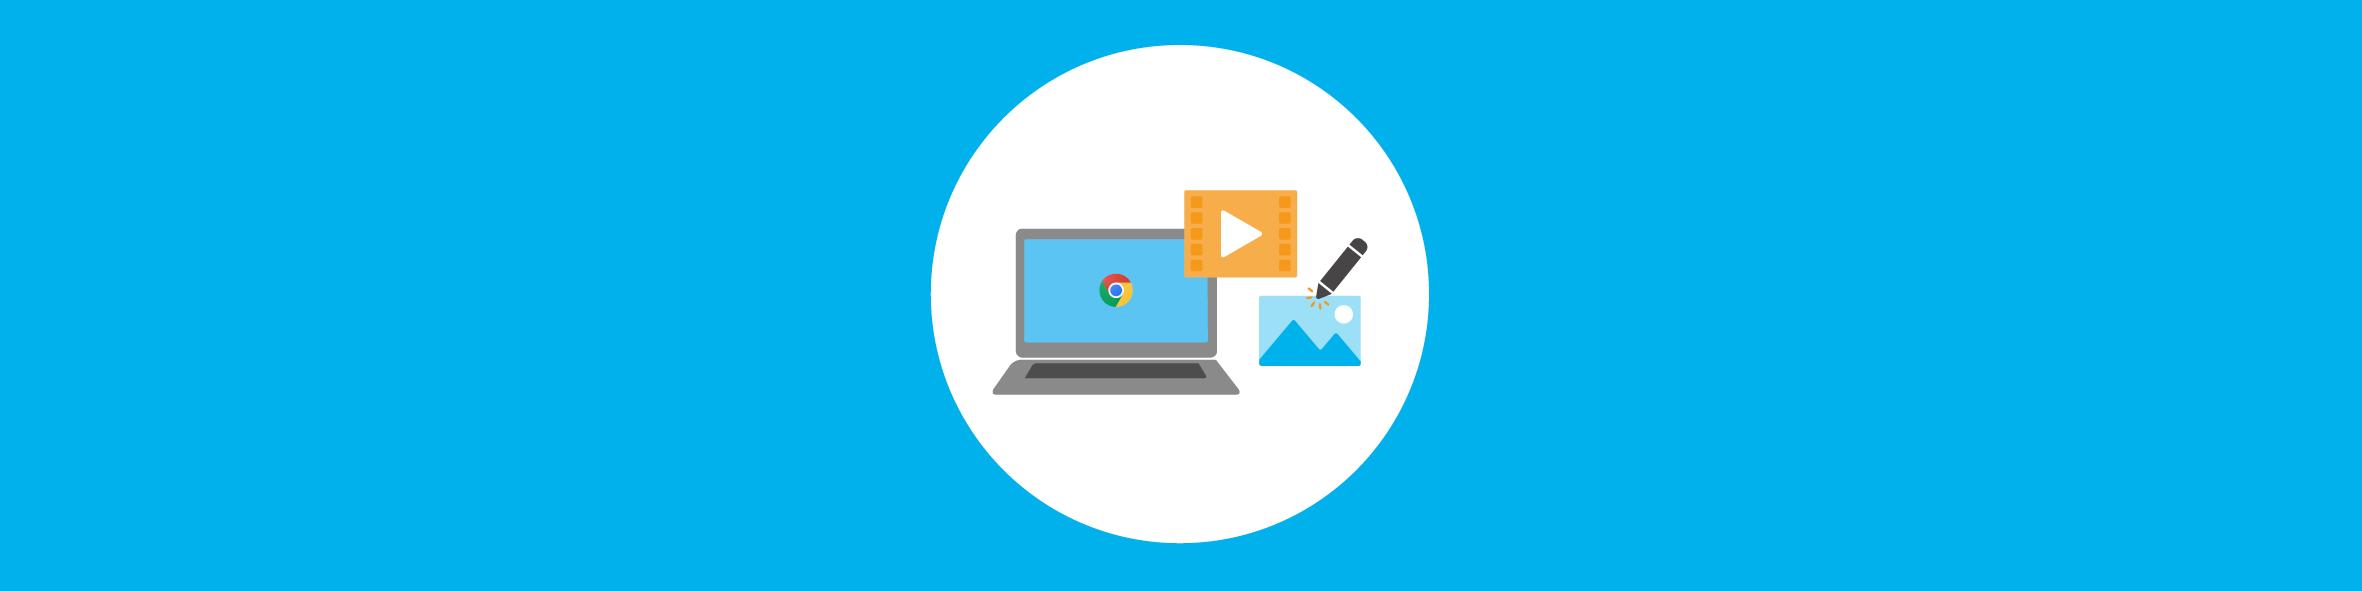 Creatief met Chromebooks - Cloudwise Academy header trainingsaanbod